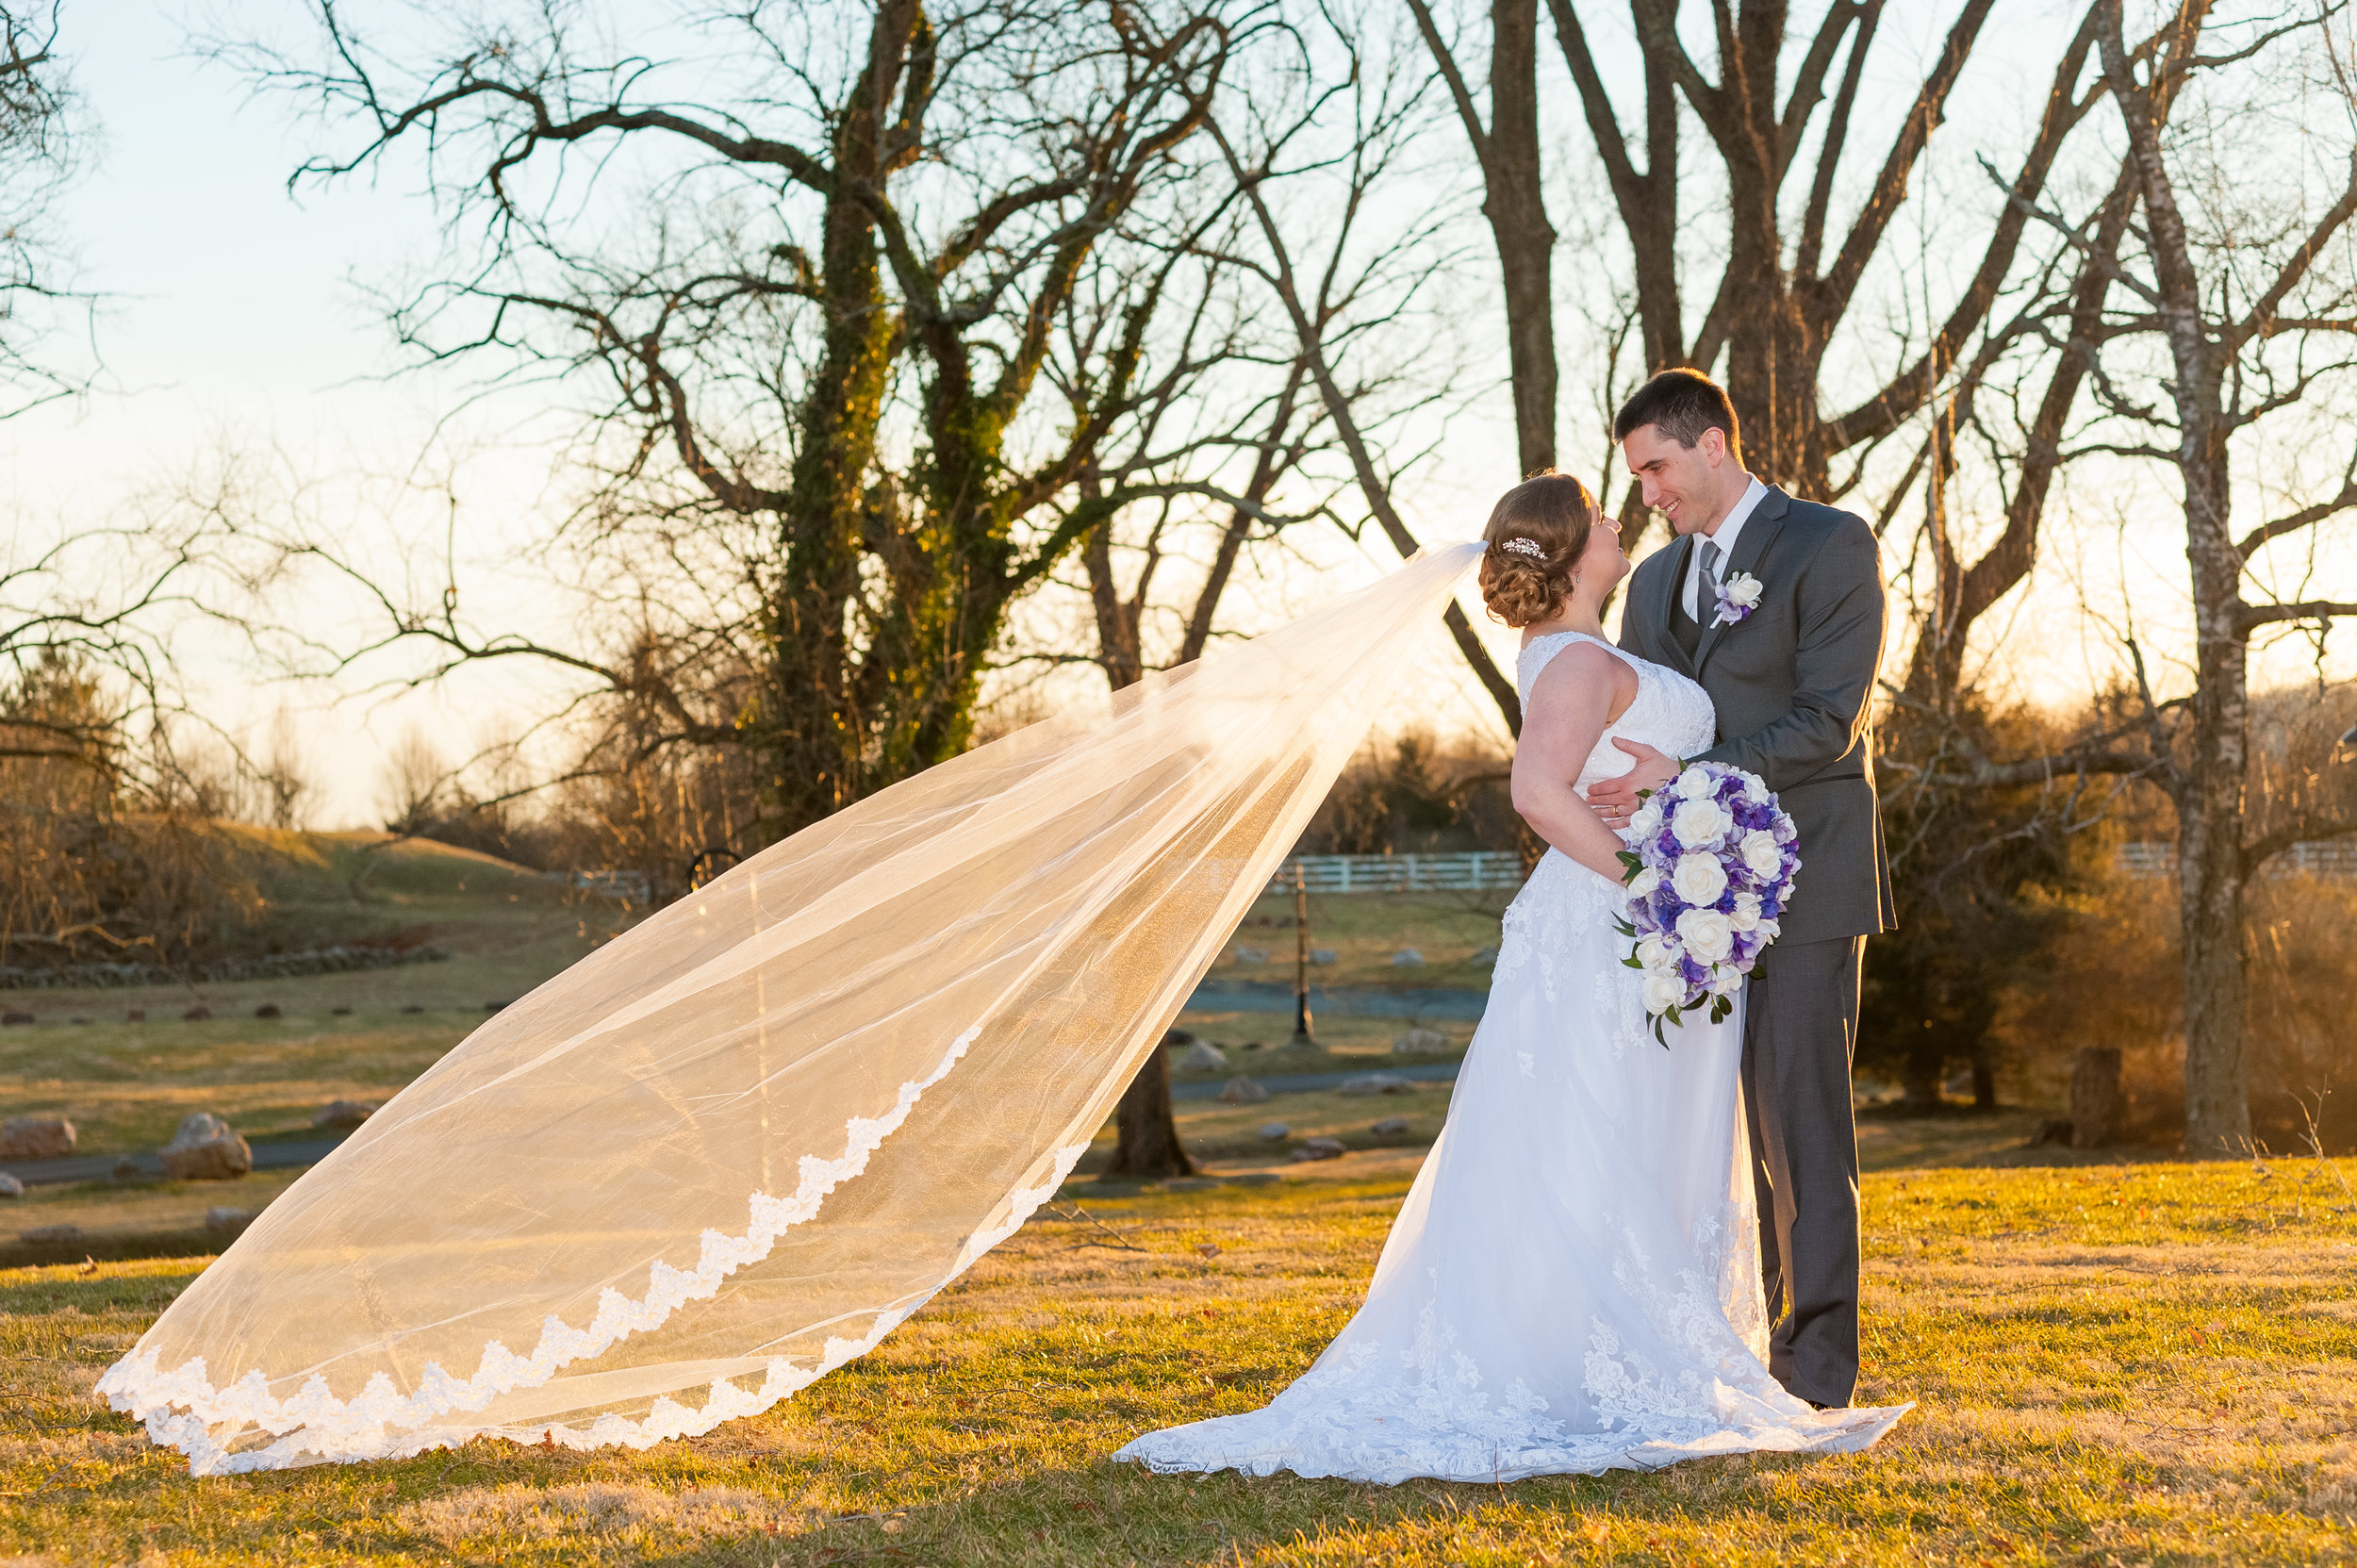 Emily & Greg 02.09.19 Classic Wedding Photographers0876.JPG